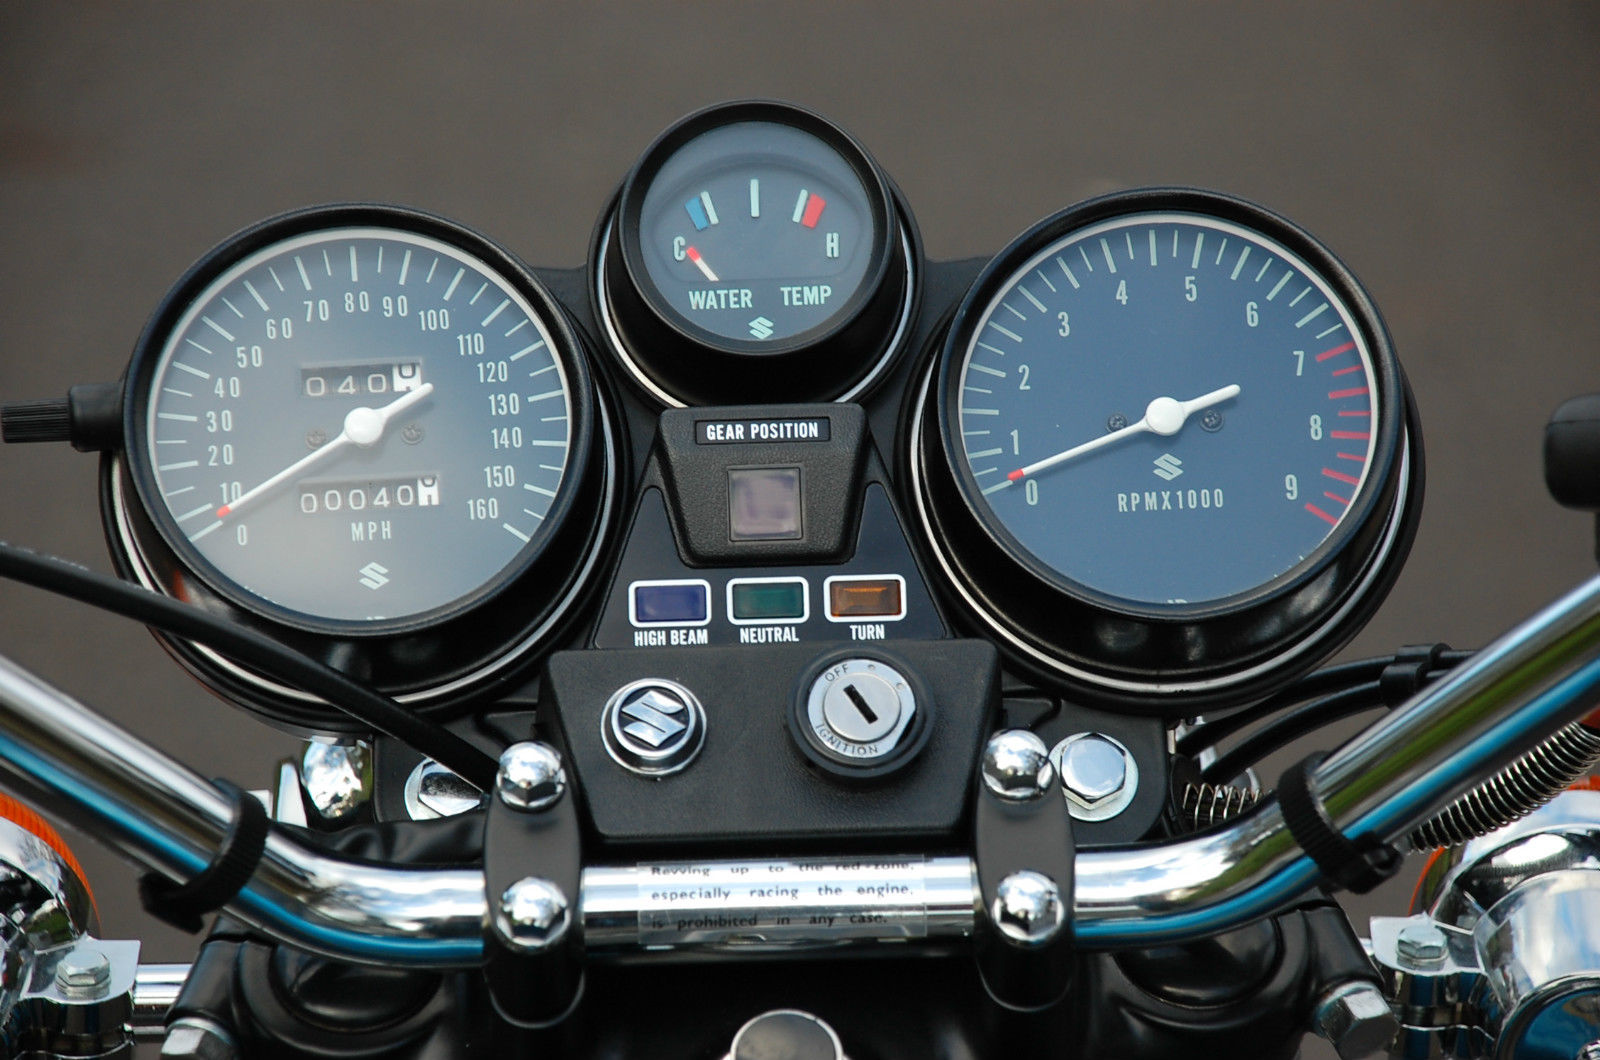 Suzuki GT750 - 1975 - Clocks, Speedo, Tacho, Water Temp, Ignition Switch and Handlebar Clamp.